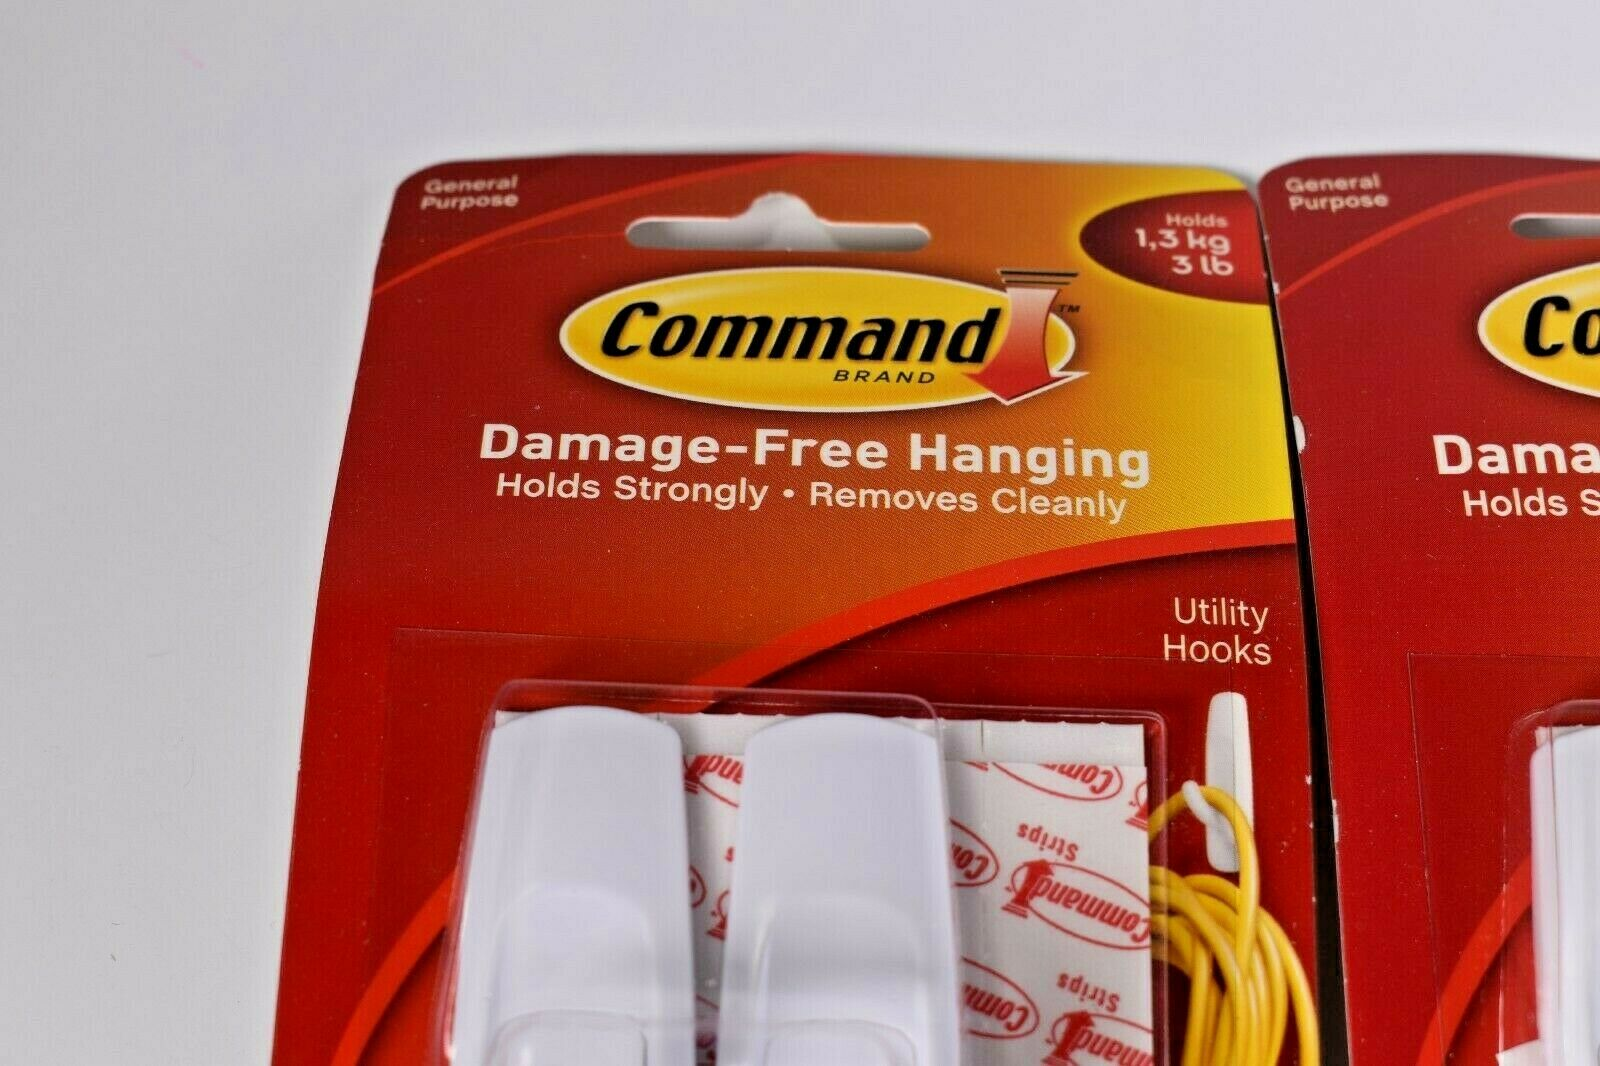 Command General Purpose Hooks 1lb Capacity Plastic White 8 Hooks 16 Strips